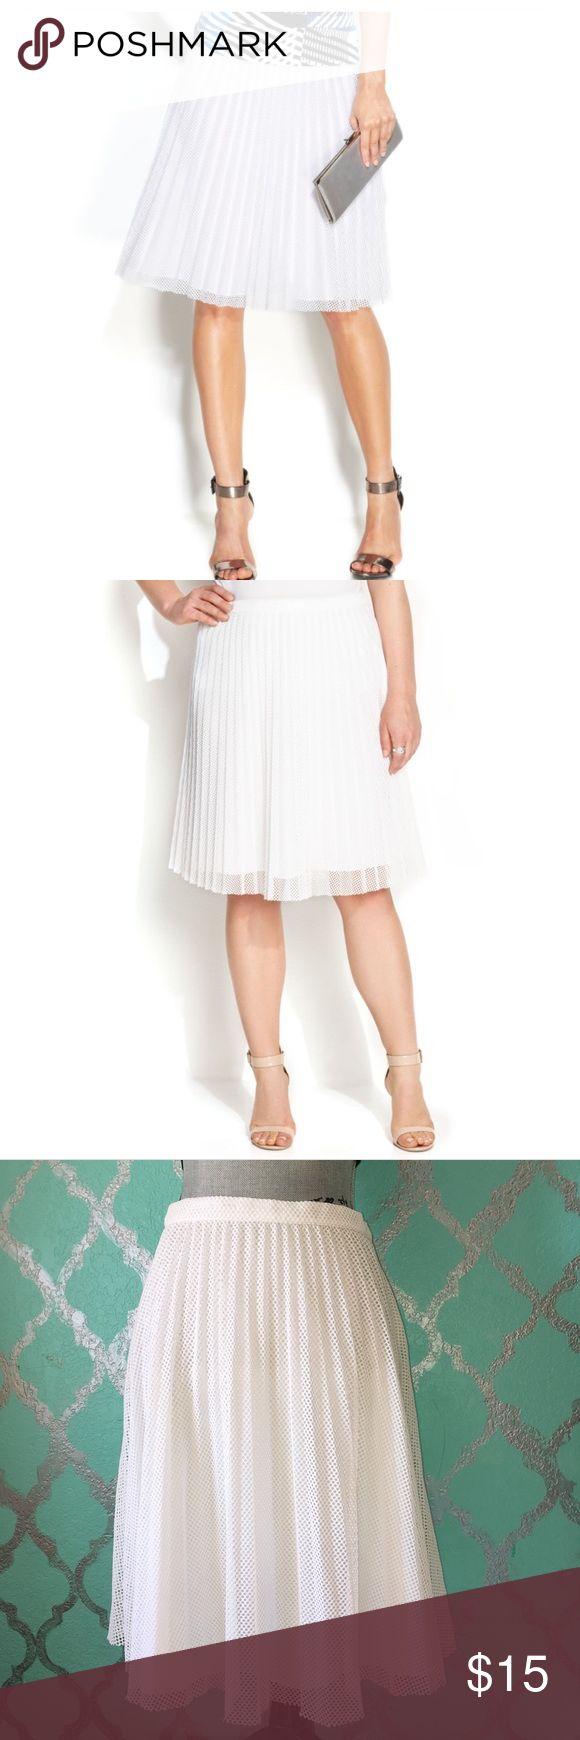 Calvin Klein Pleated Skirt Calvin Klein Pleated Skirt Size: 2  Color: White Calvin Klein Skirts Midi